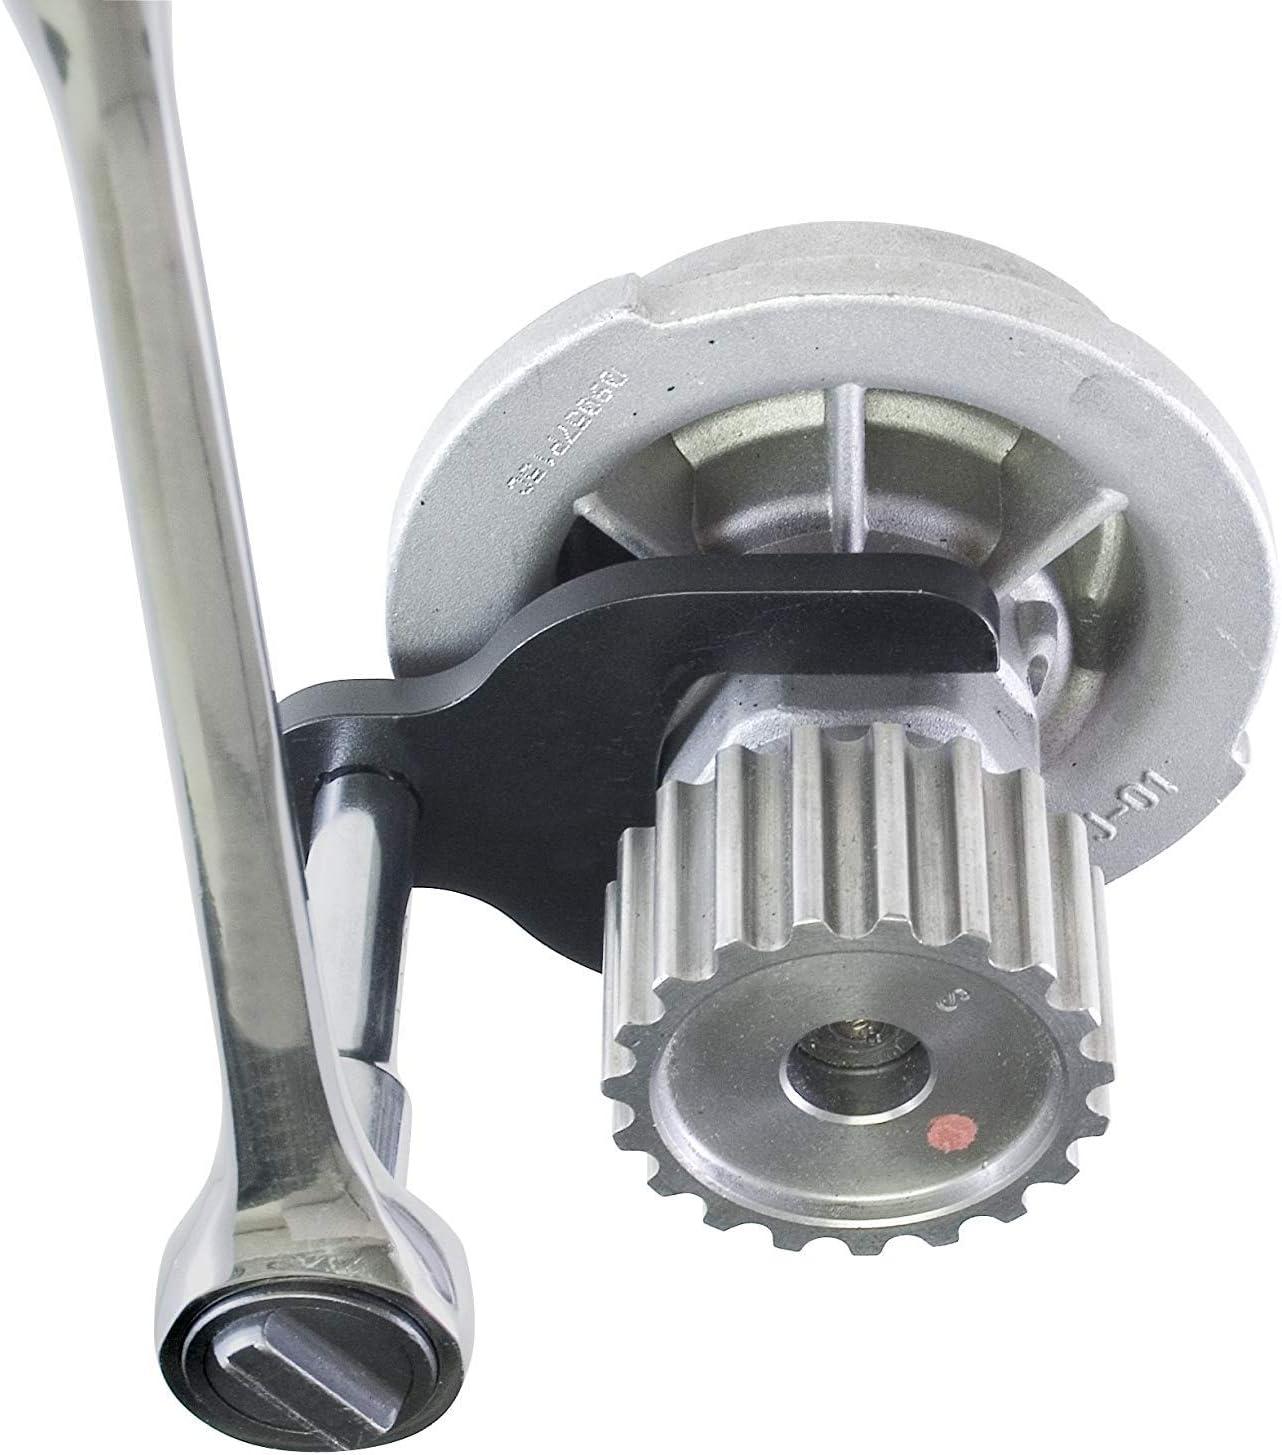 Sets & Kits DPTOOL 8pcs Engine Camshaft Tensioning Locking ...